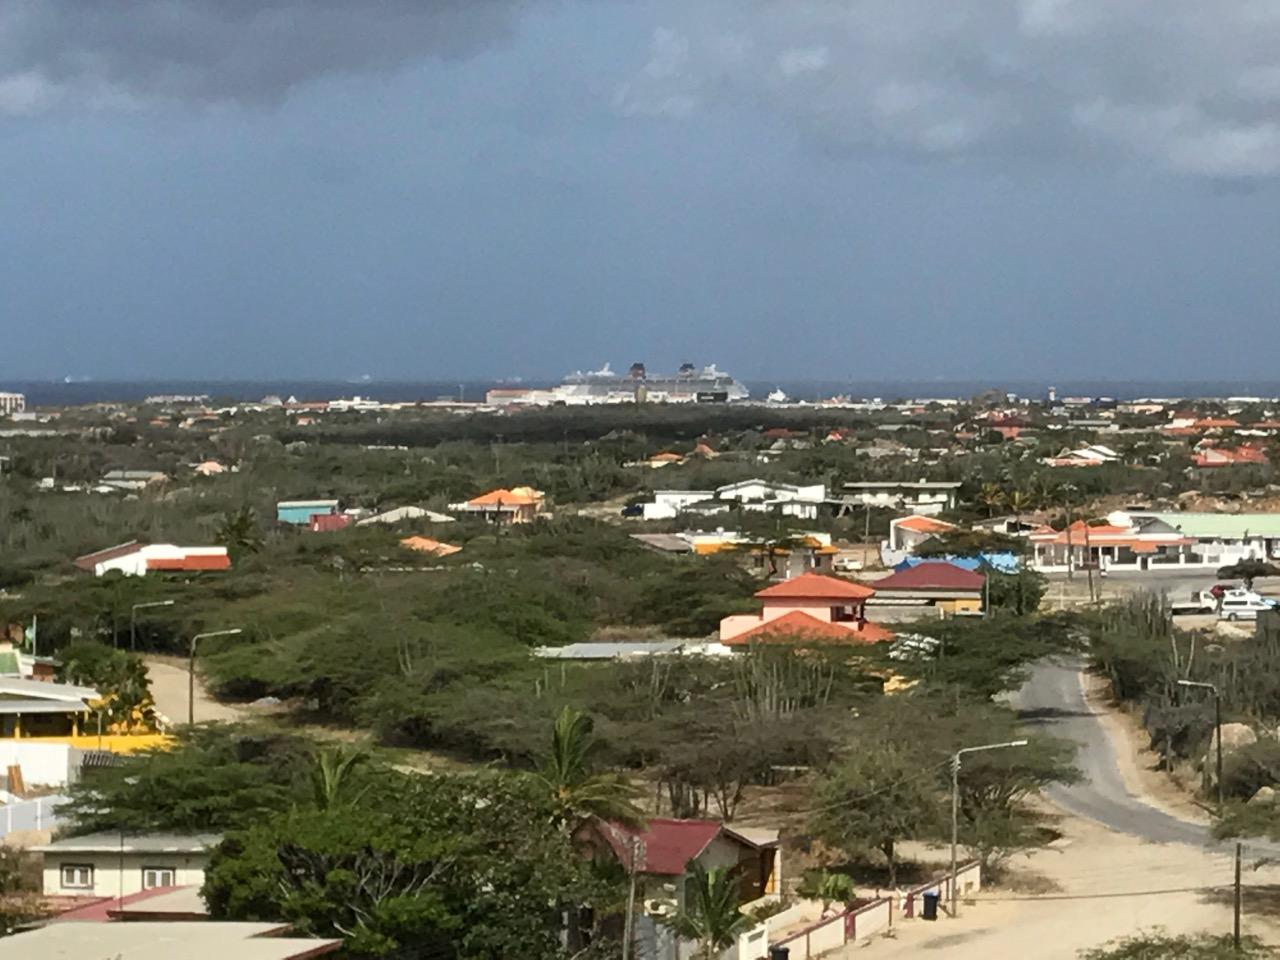 Disney Fantasy in the port of Aruba